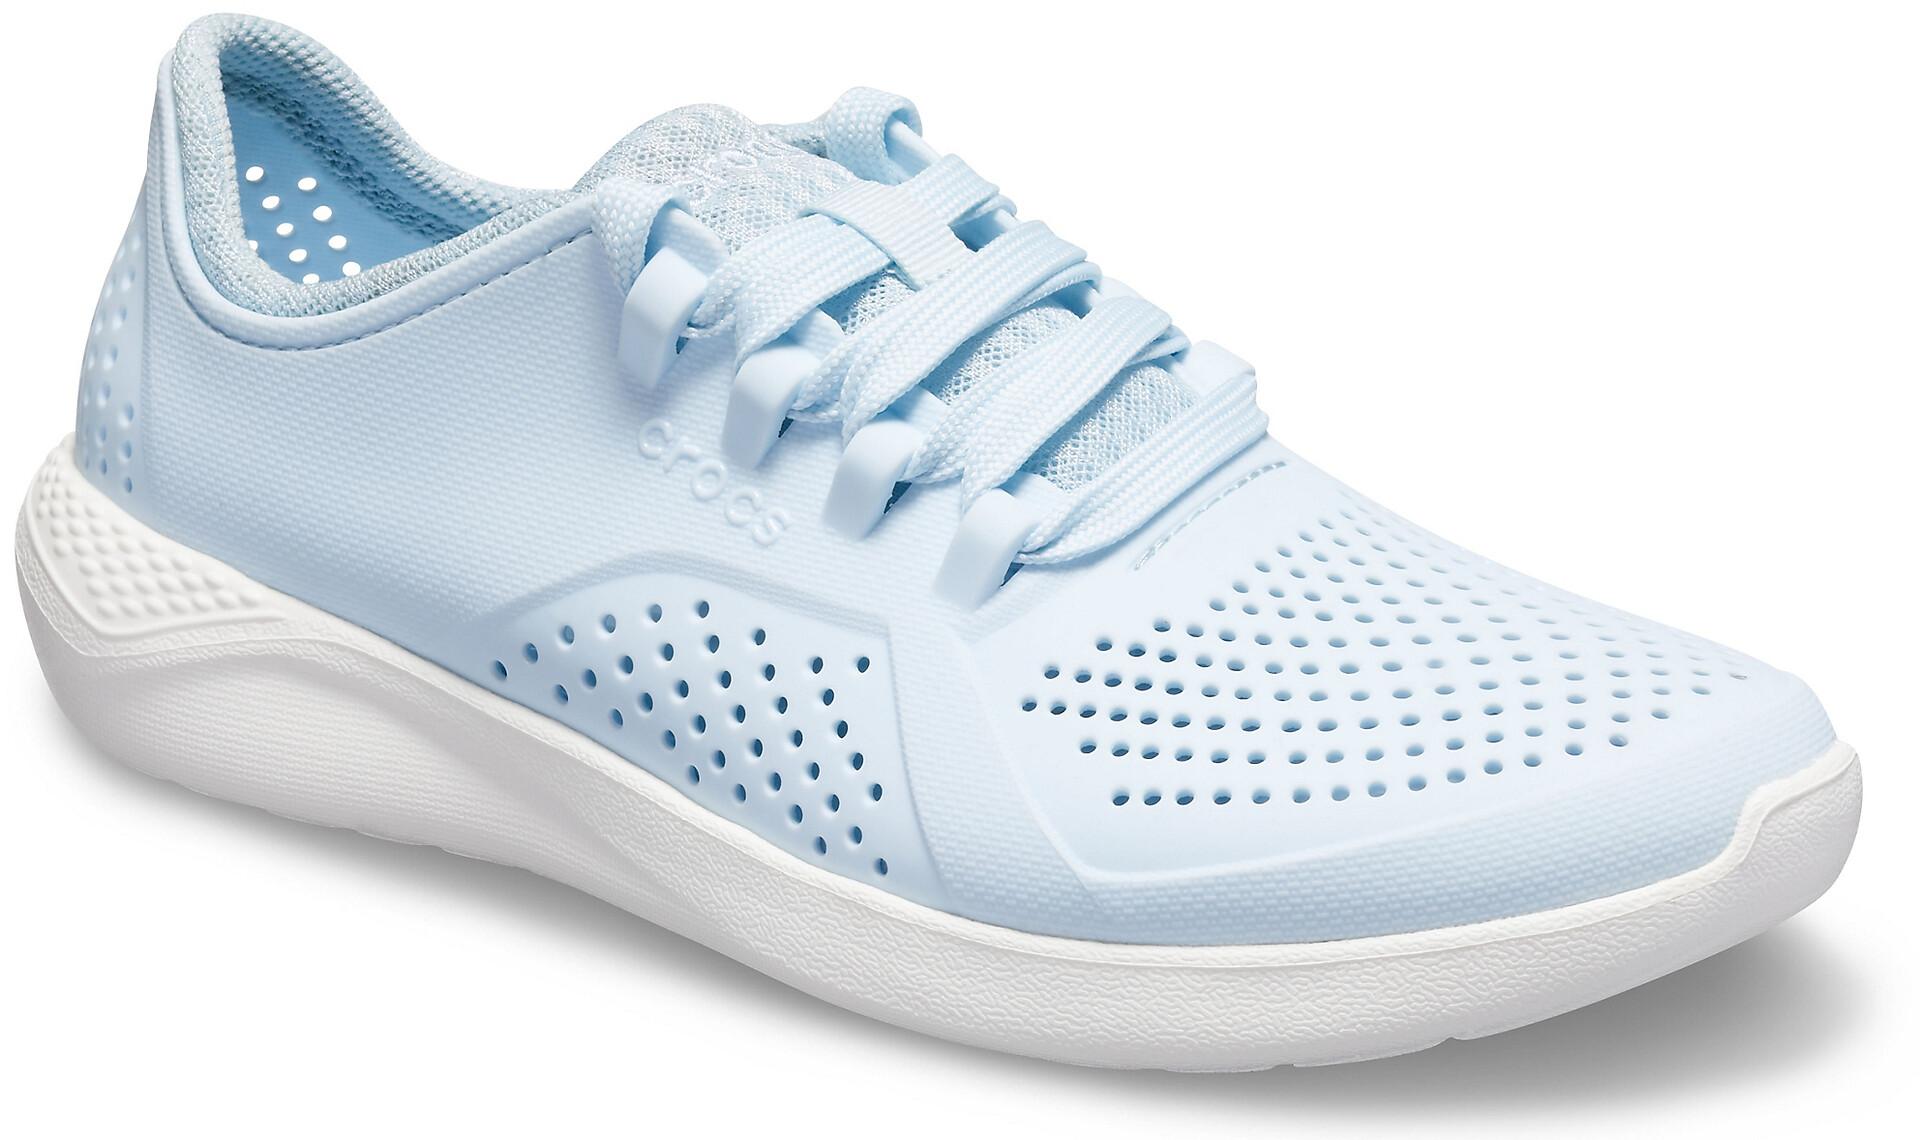 Crocs LiteRide Pacer Schoenen Dames, mineral bluewhite